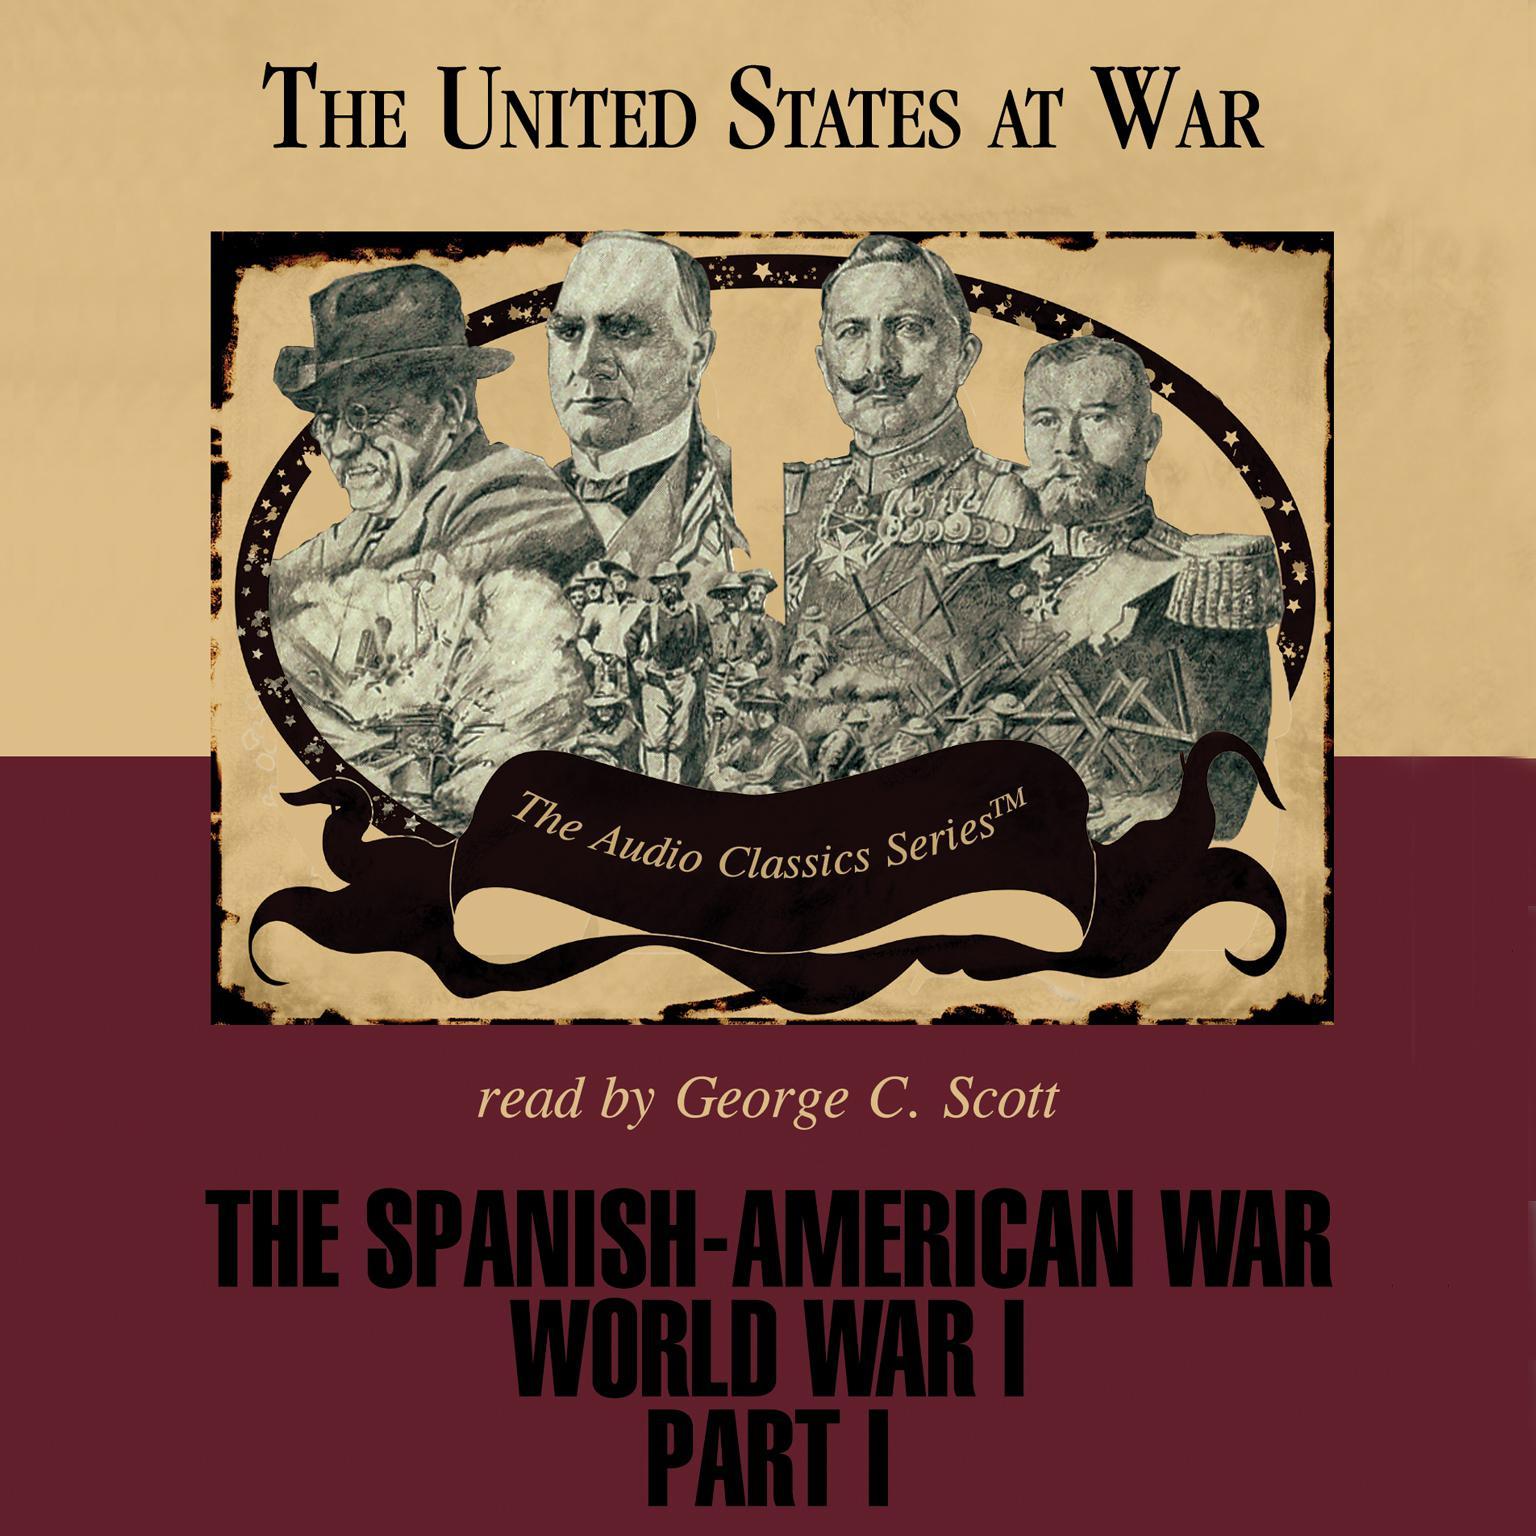 The Spanish American War And World War I Part 1